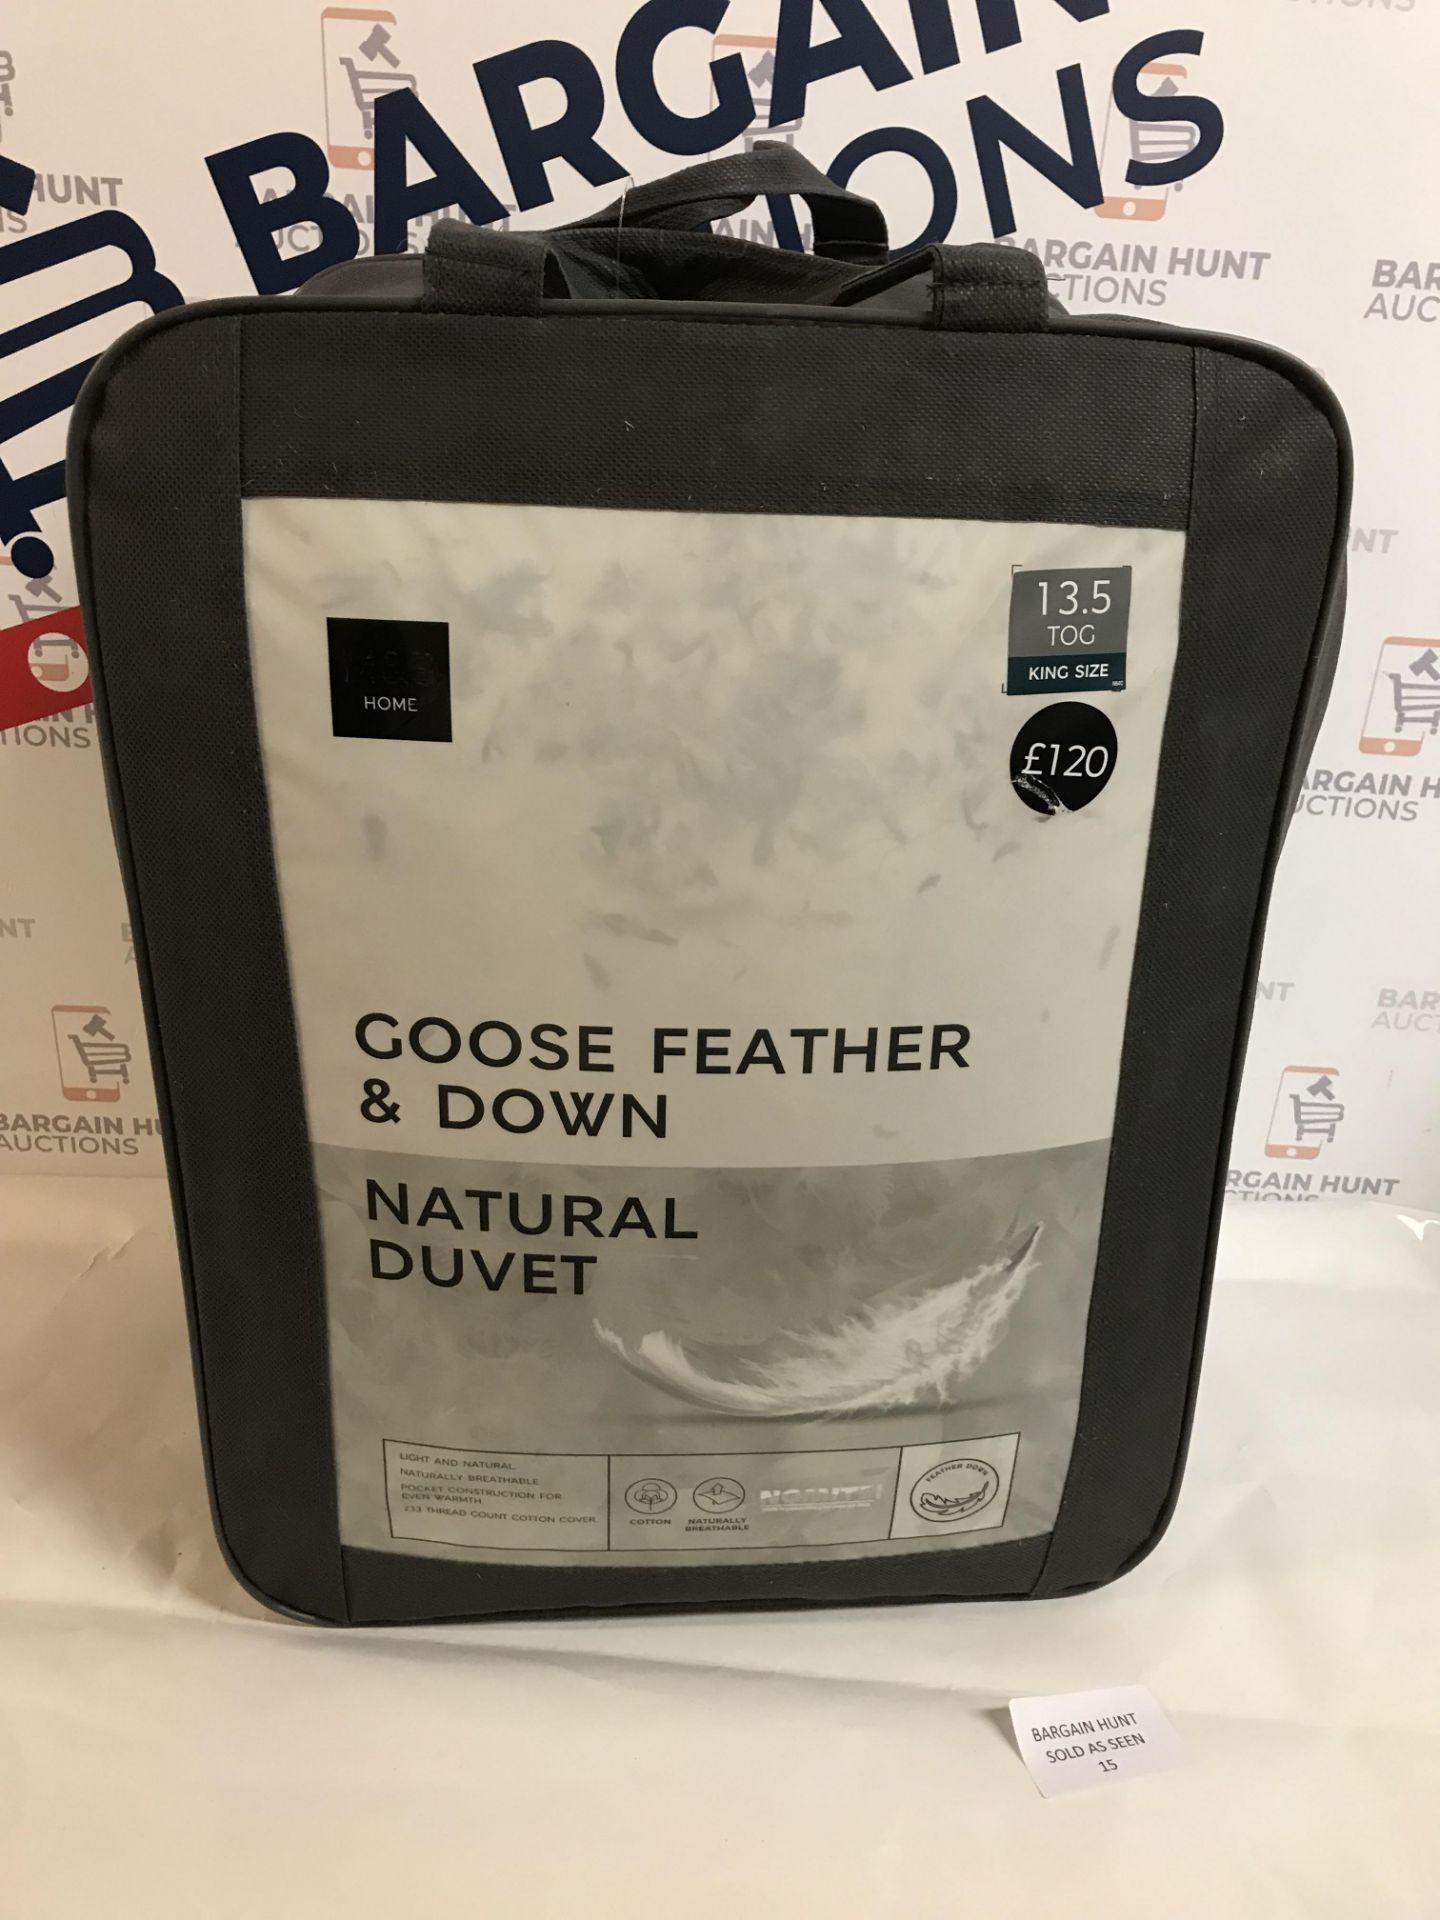 Lot 15 - Goose Feather & Down Natural 13.5 Tog Duvet, King Size